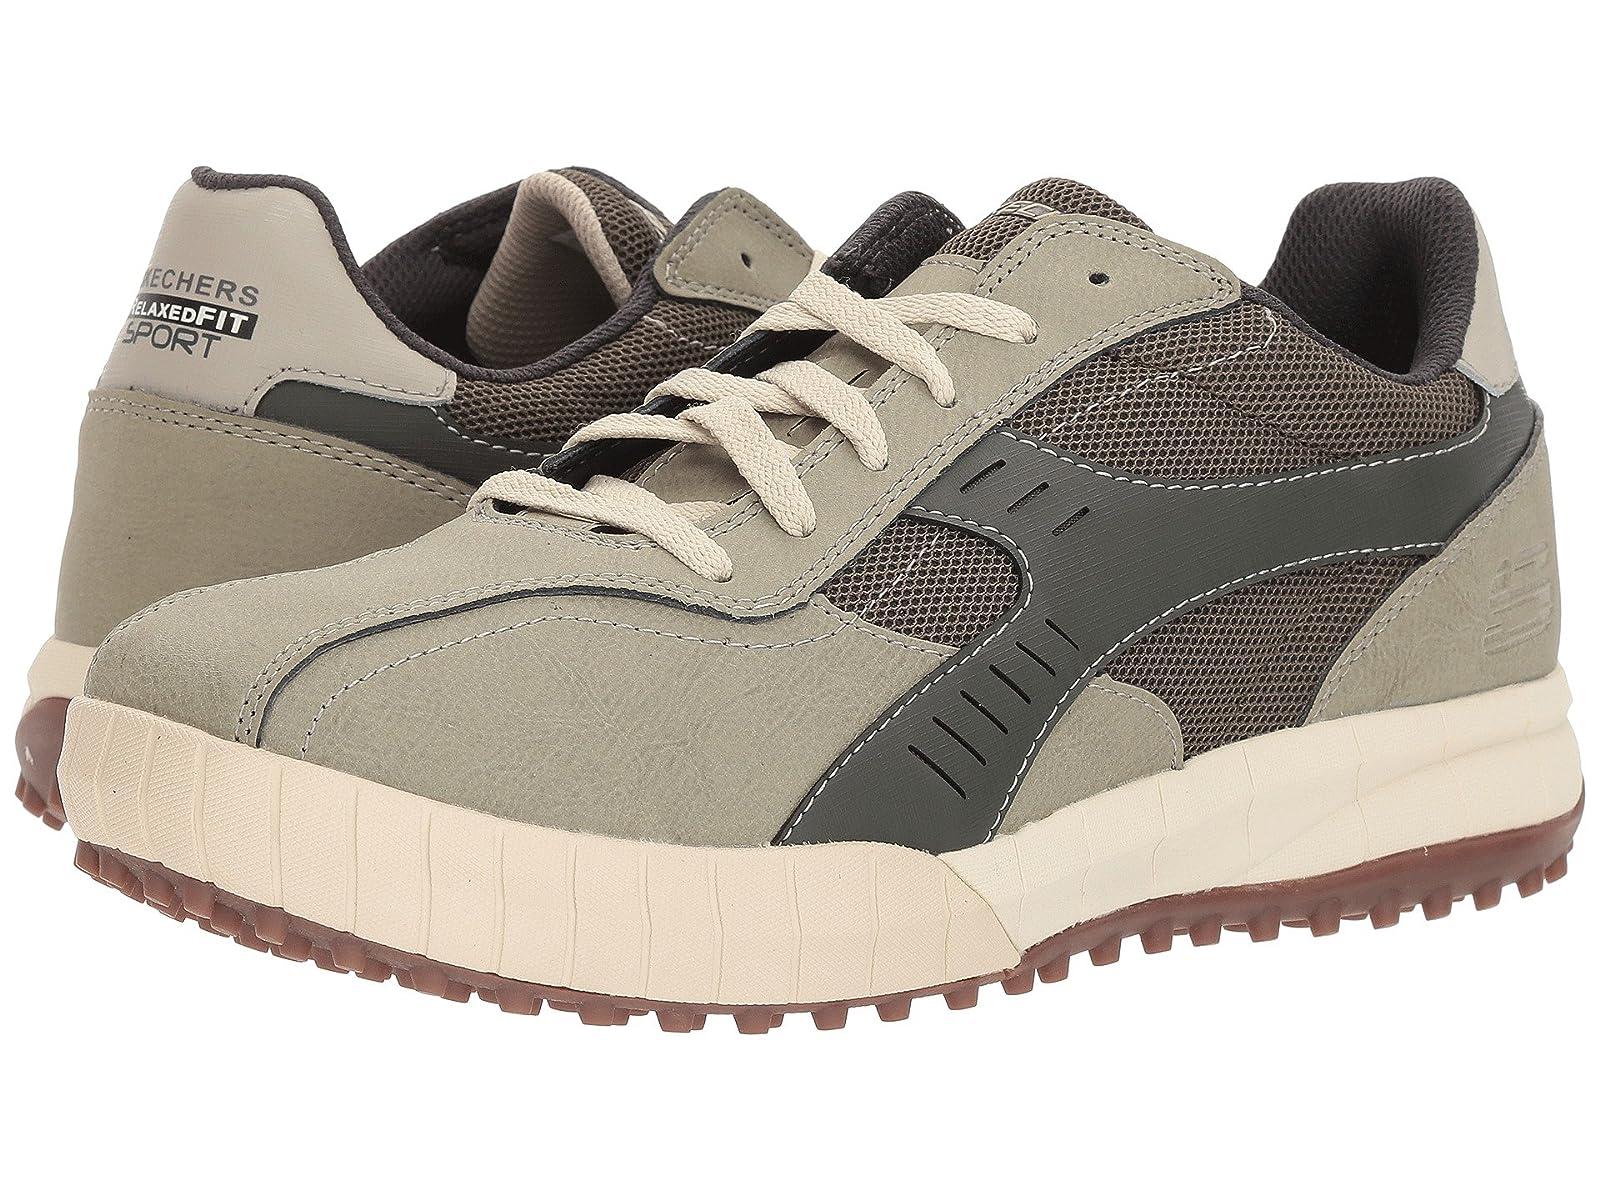 SKECHERS Floater 2.0Atmospheric grades have affordable shoes